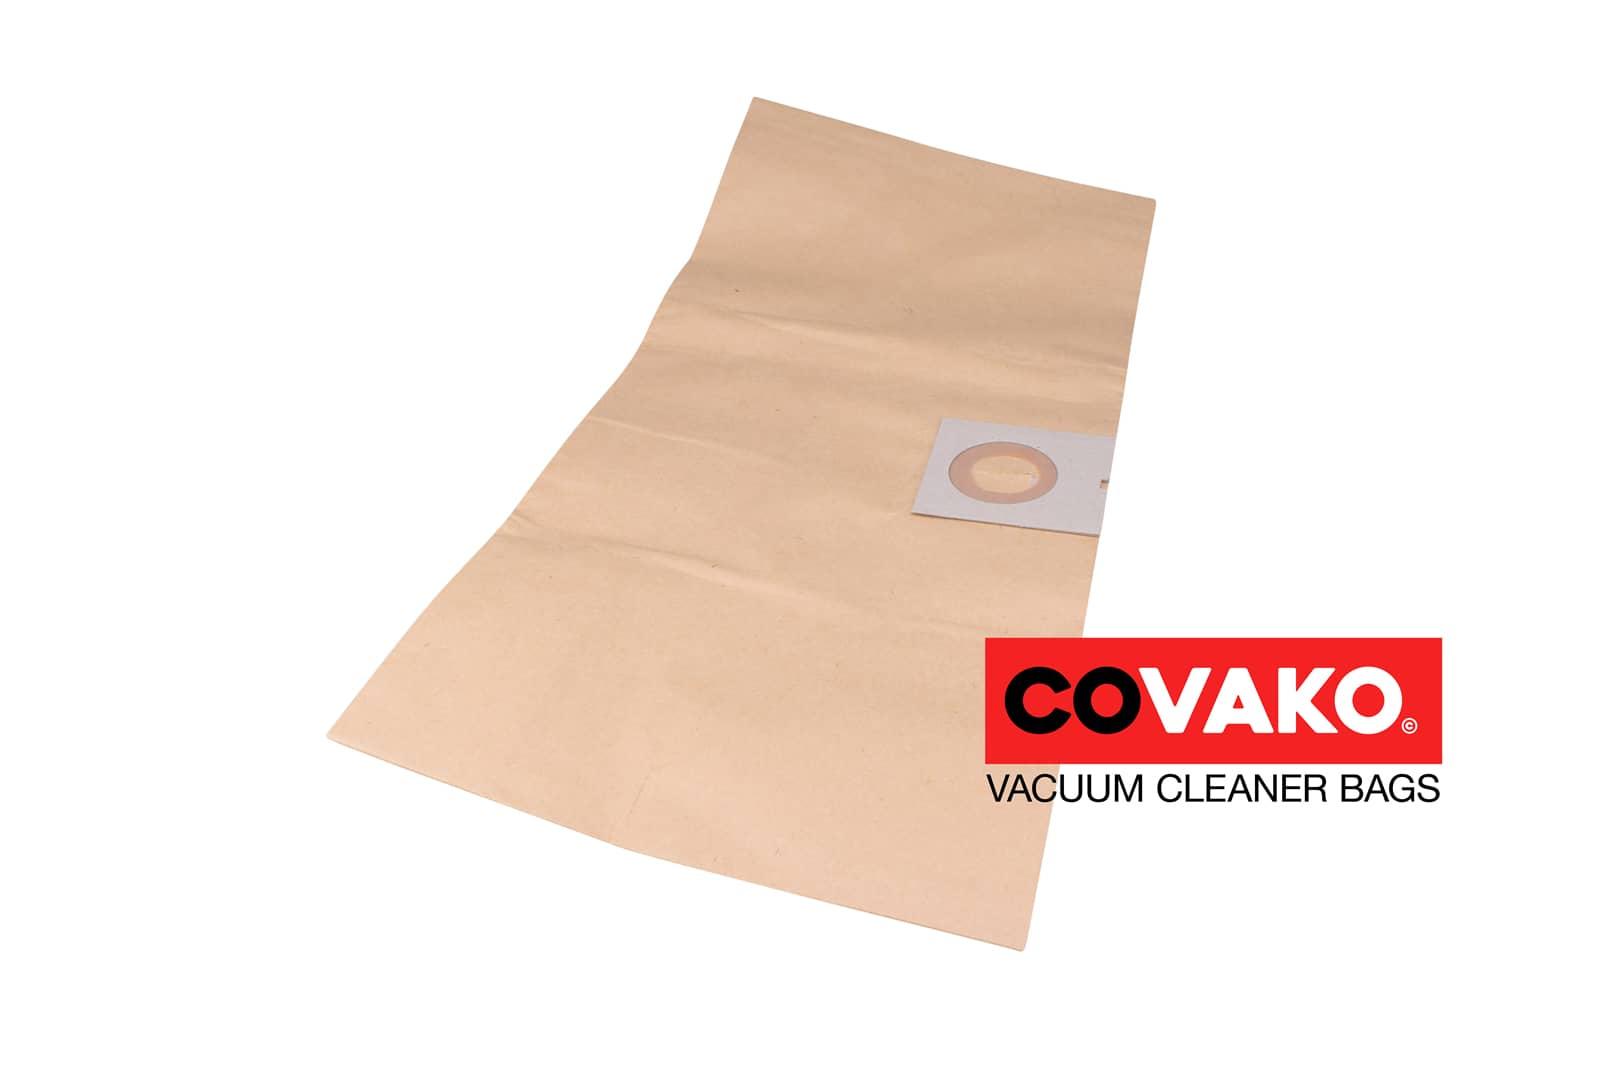 Kärcher NT 27/1 / Paper - Kärcher vacuum cleaner bags